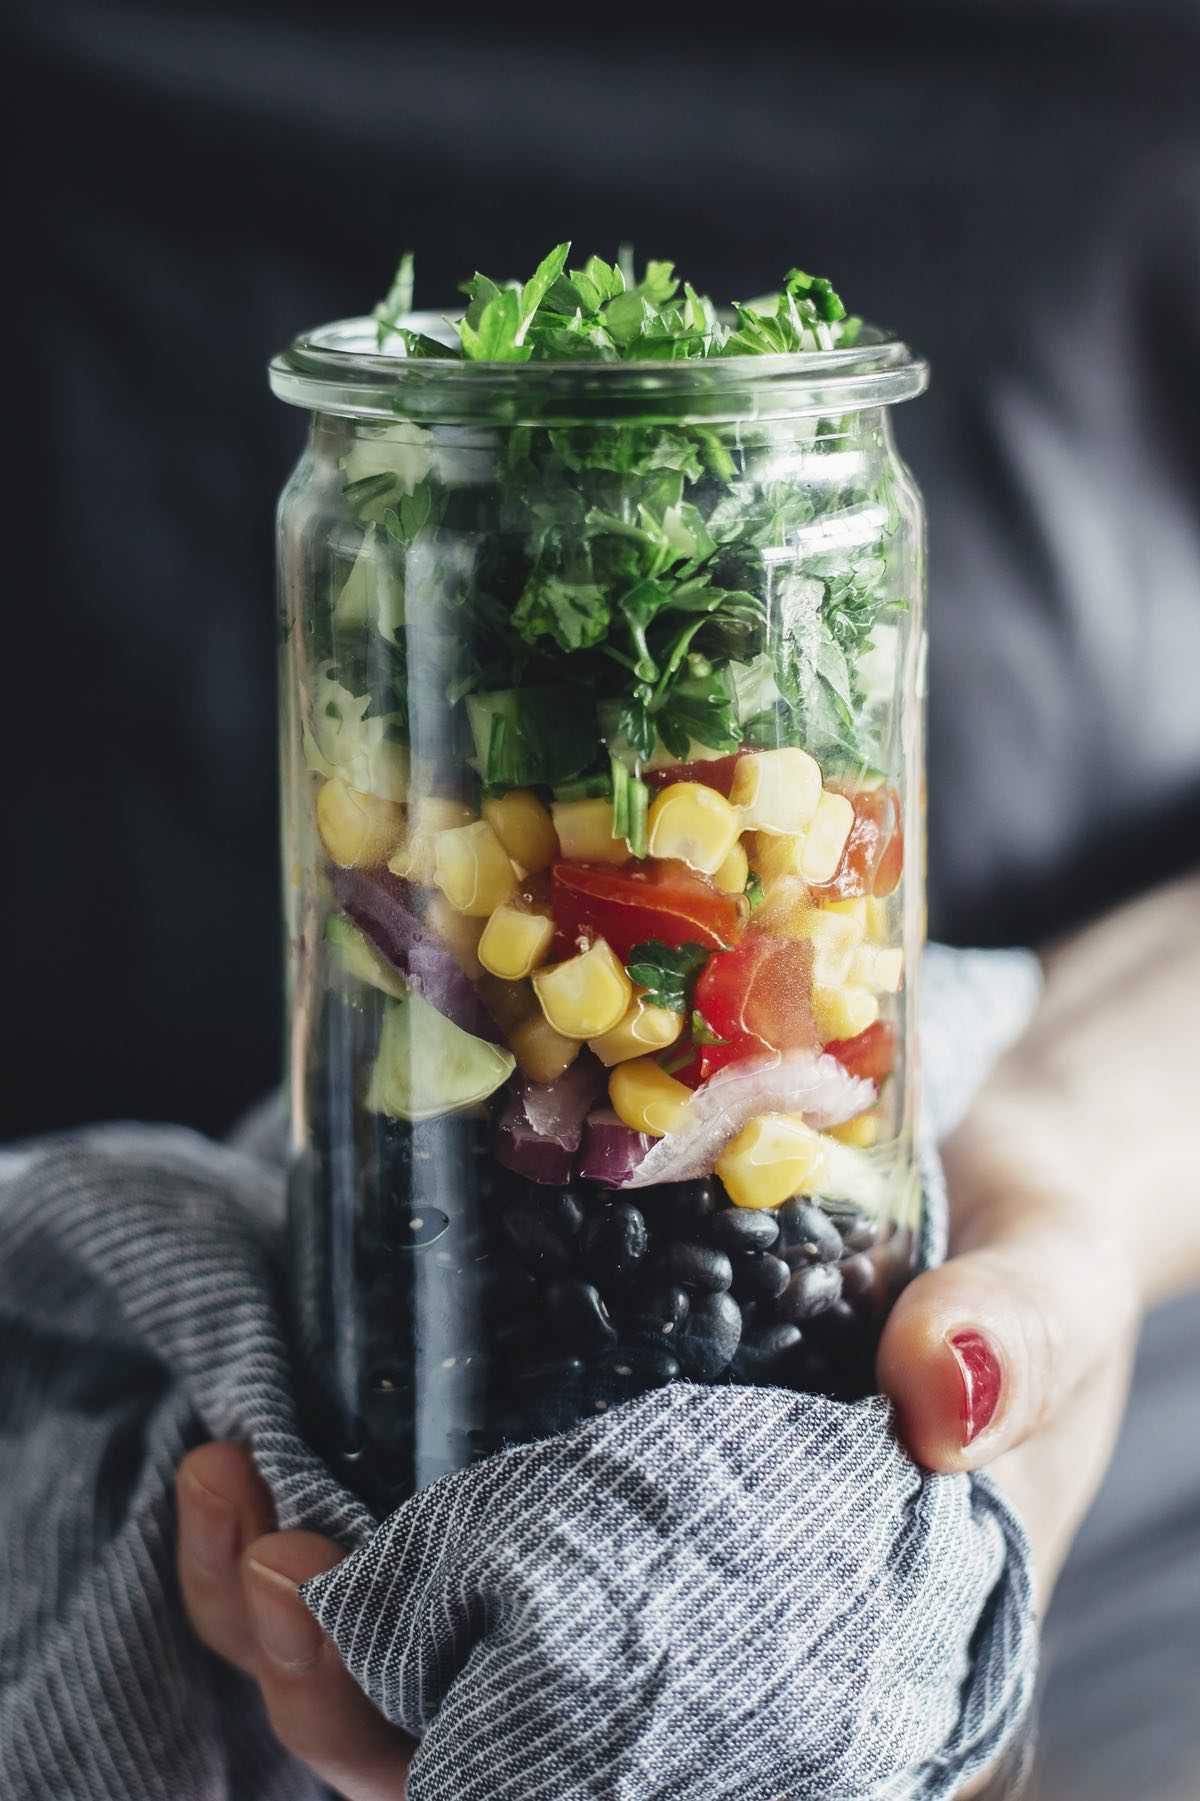 Sweet Corn Salad in a Jar